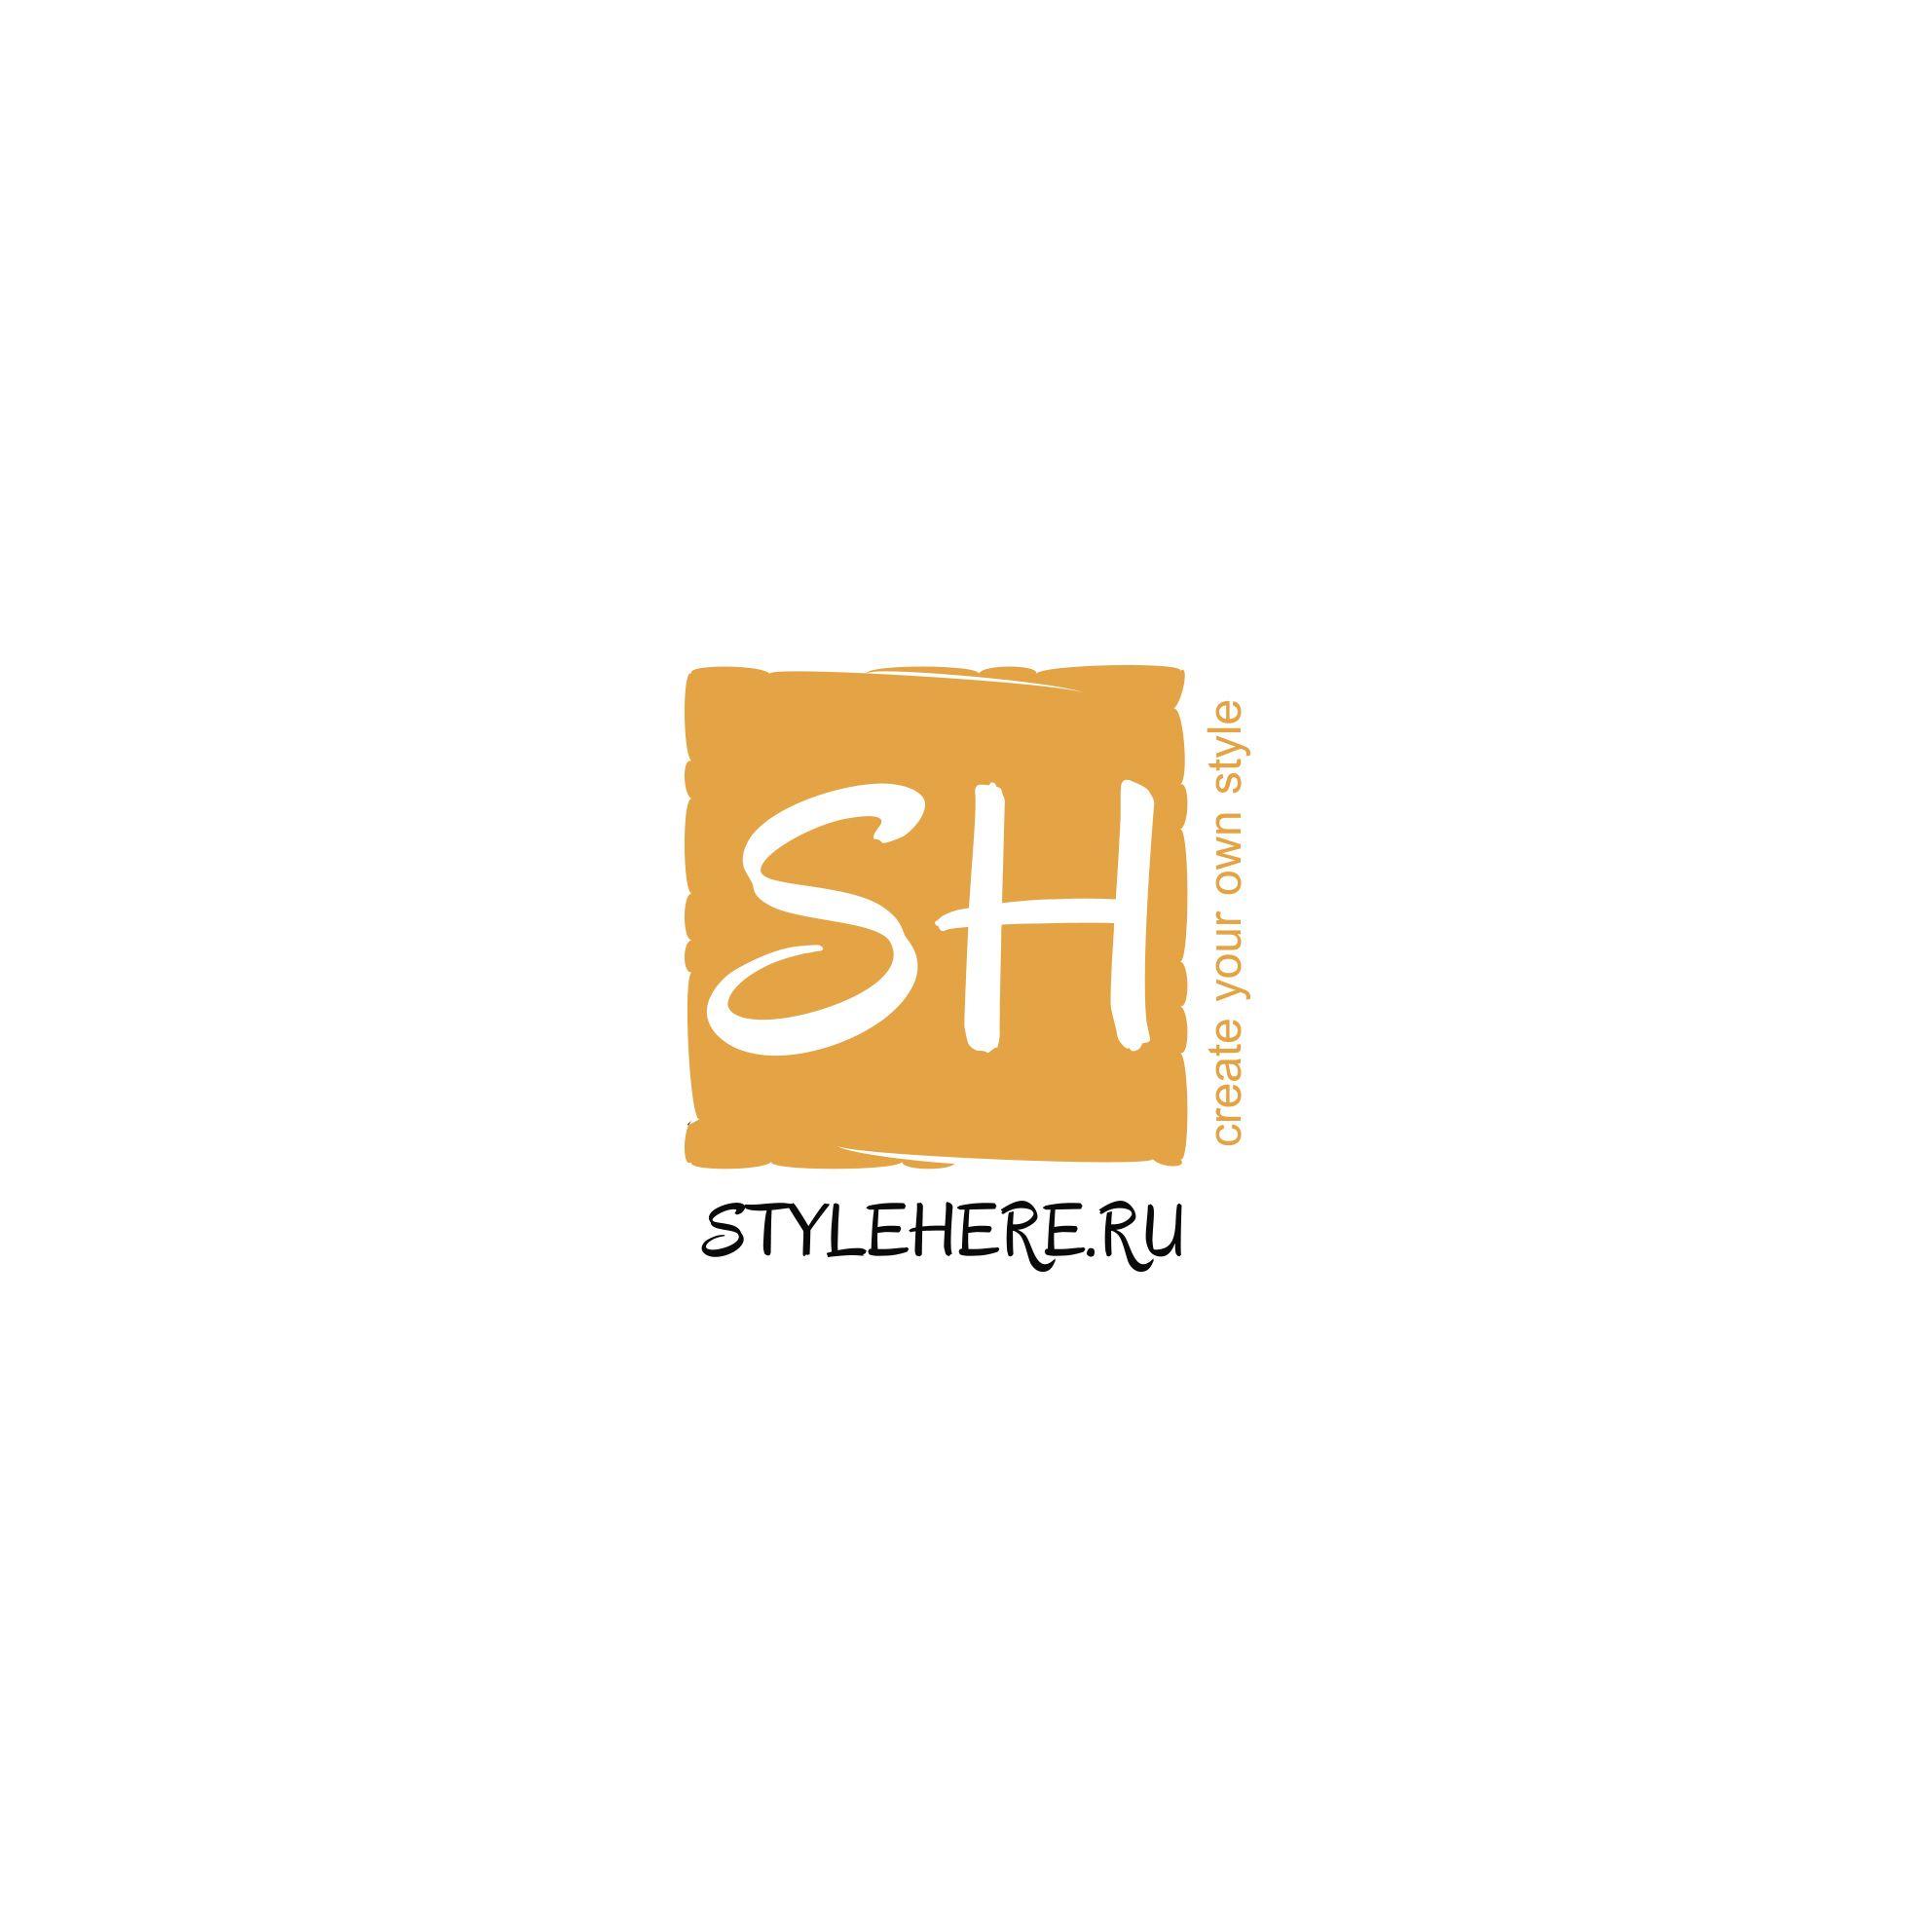 Логотип для интернет-магазина stylehere.ru - дизайнер mkravchenko